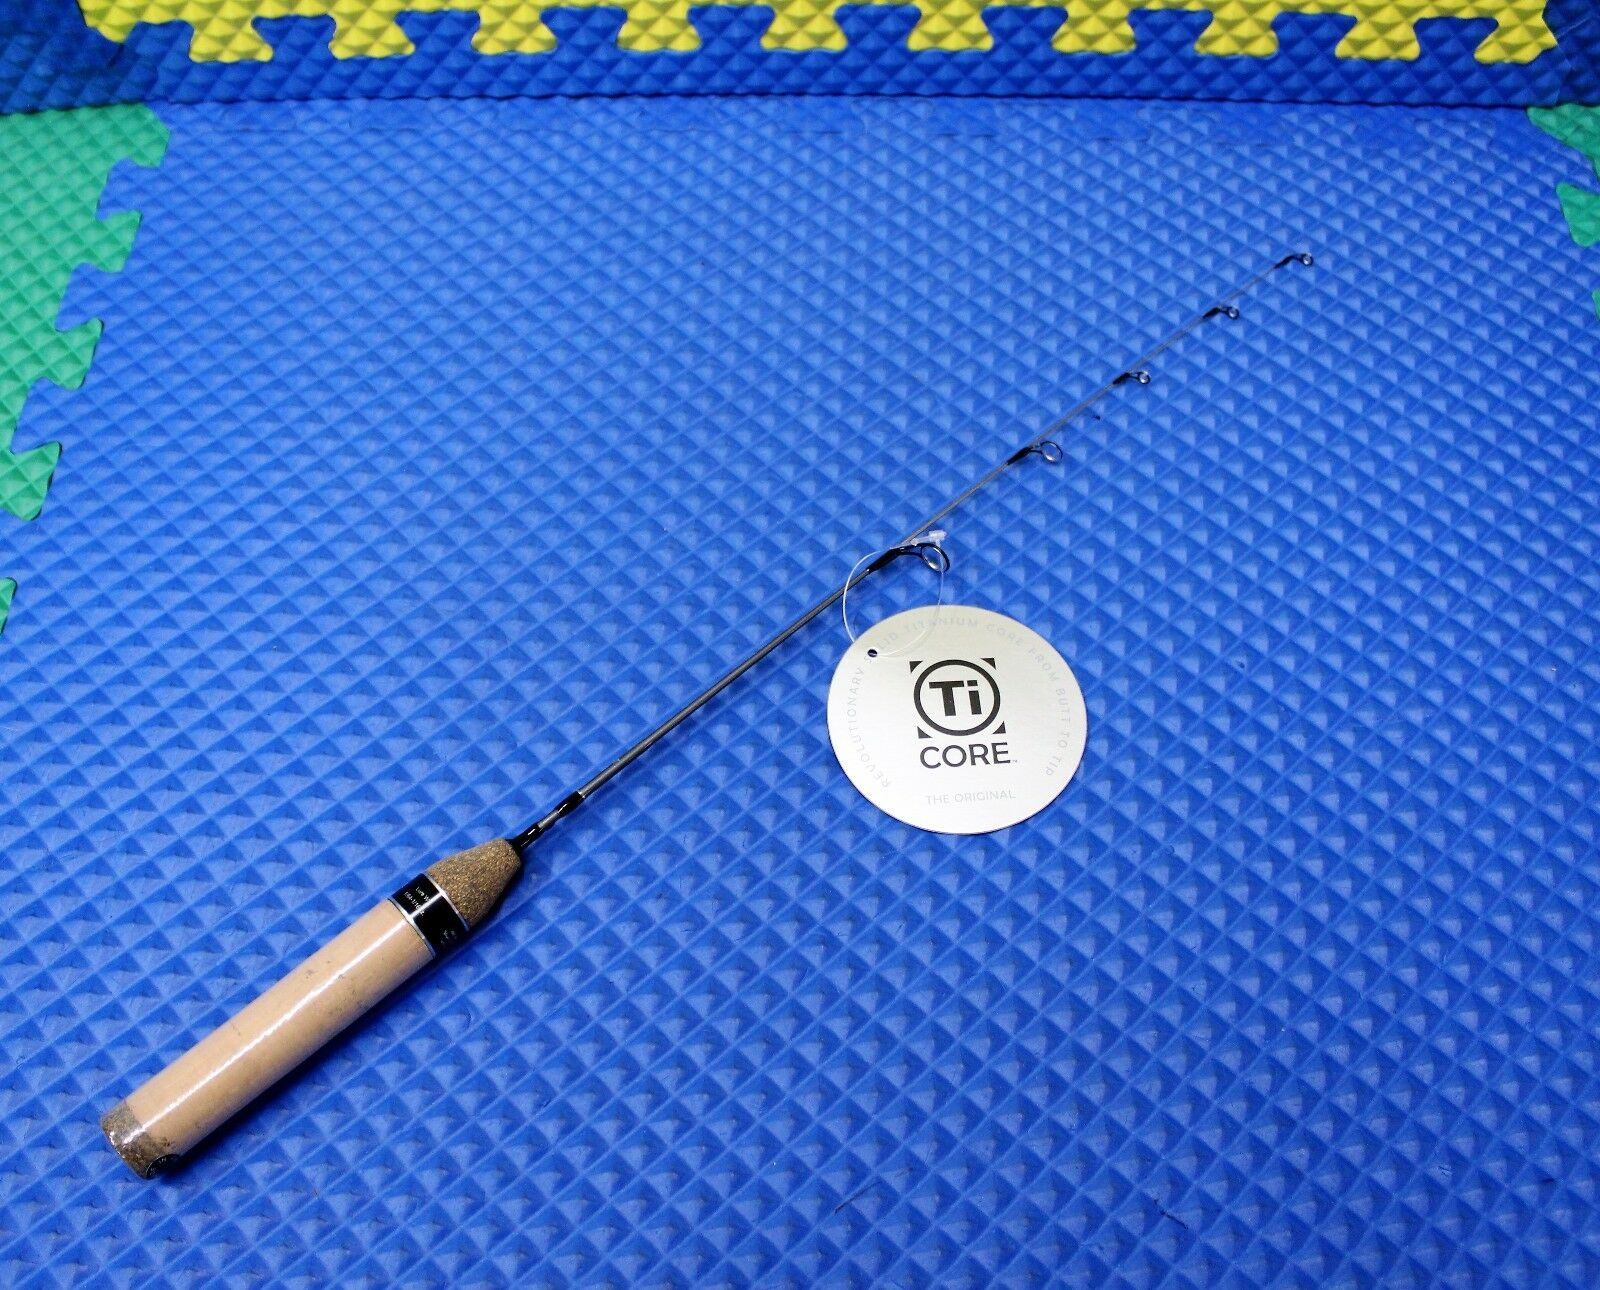 Eagle Claw Ice Fishing Titanium Core TI-CORE 20 Burgandy 20  Rod WMTC20